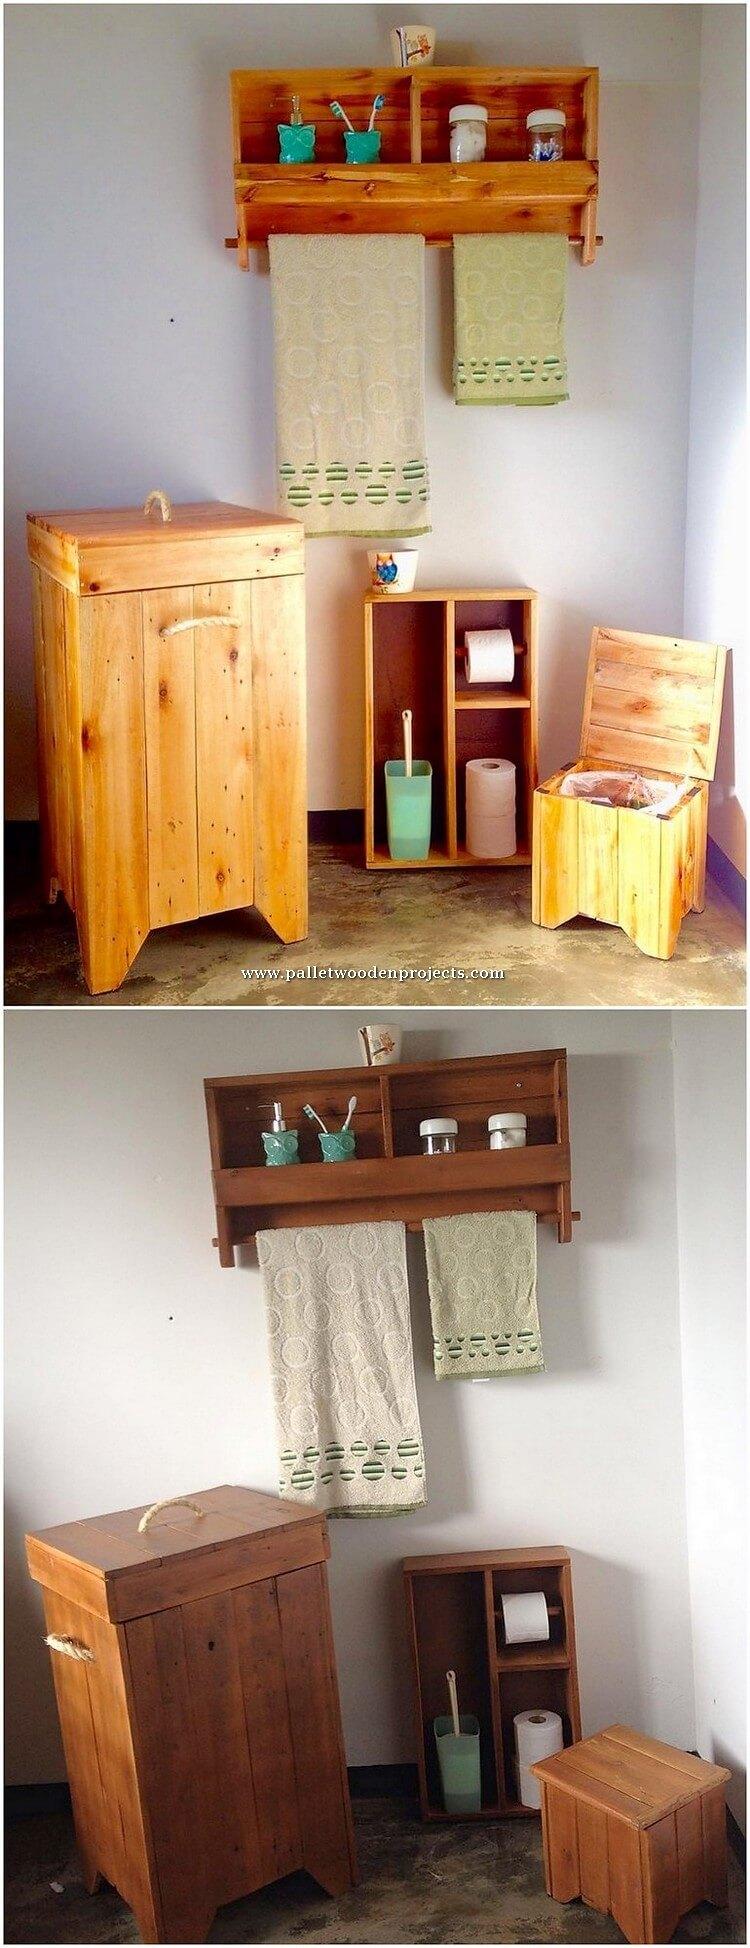 Pallet Bathroom Creations